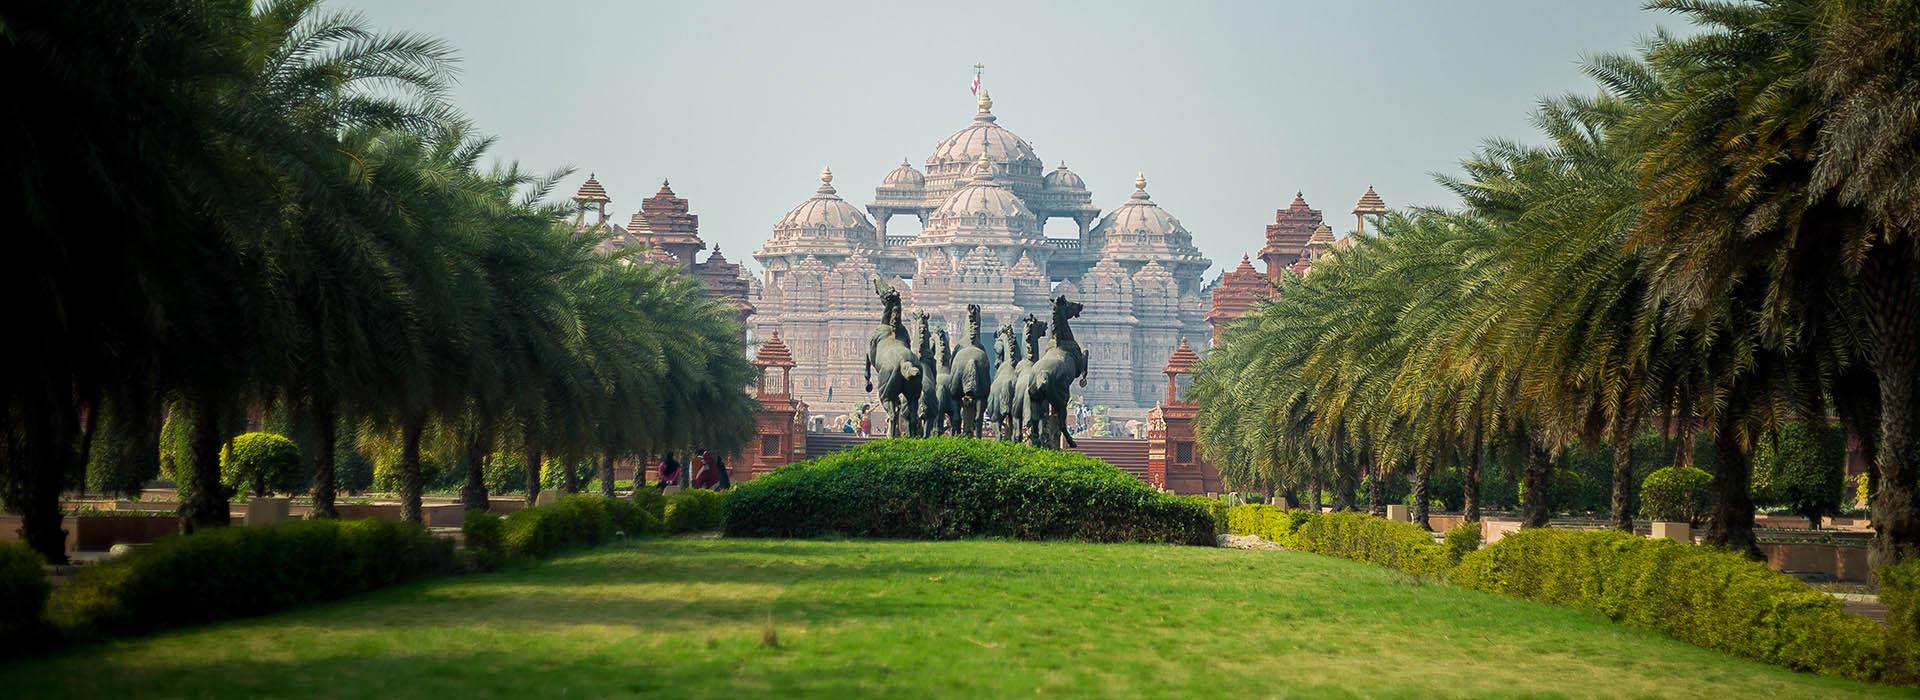 Swaminarayan Akshardham: Cultural Gardens